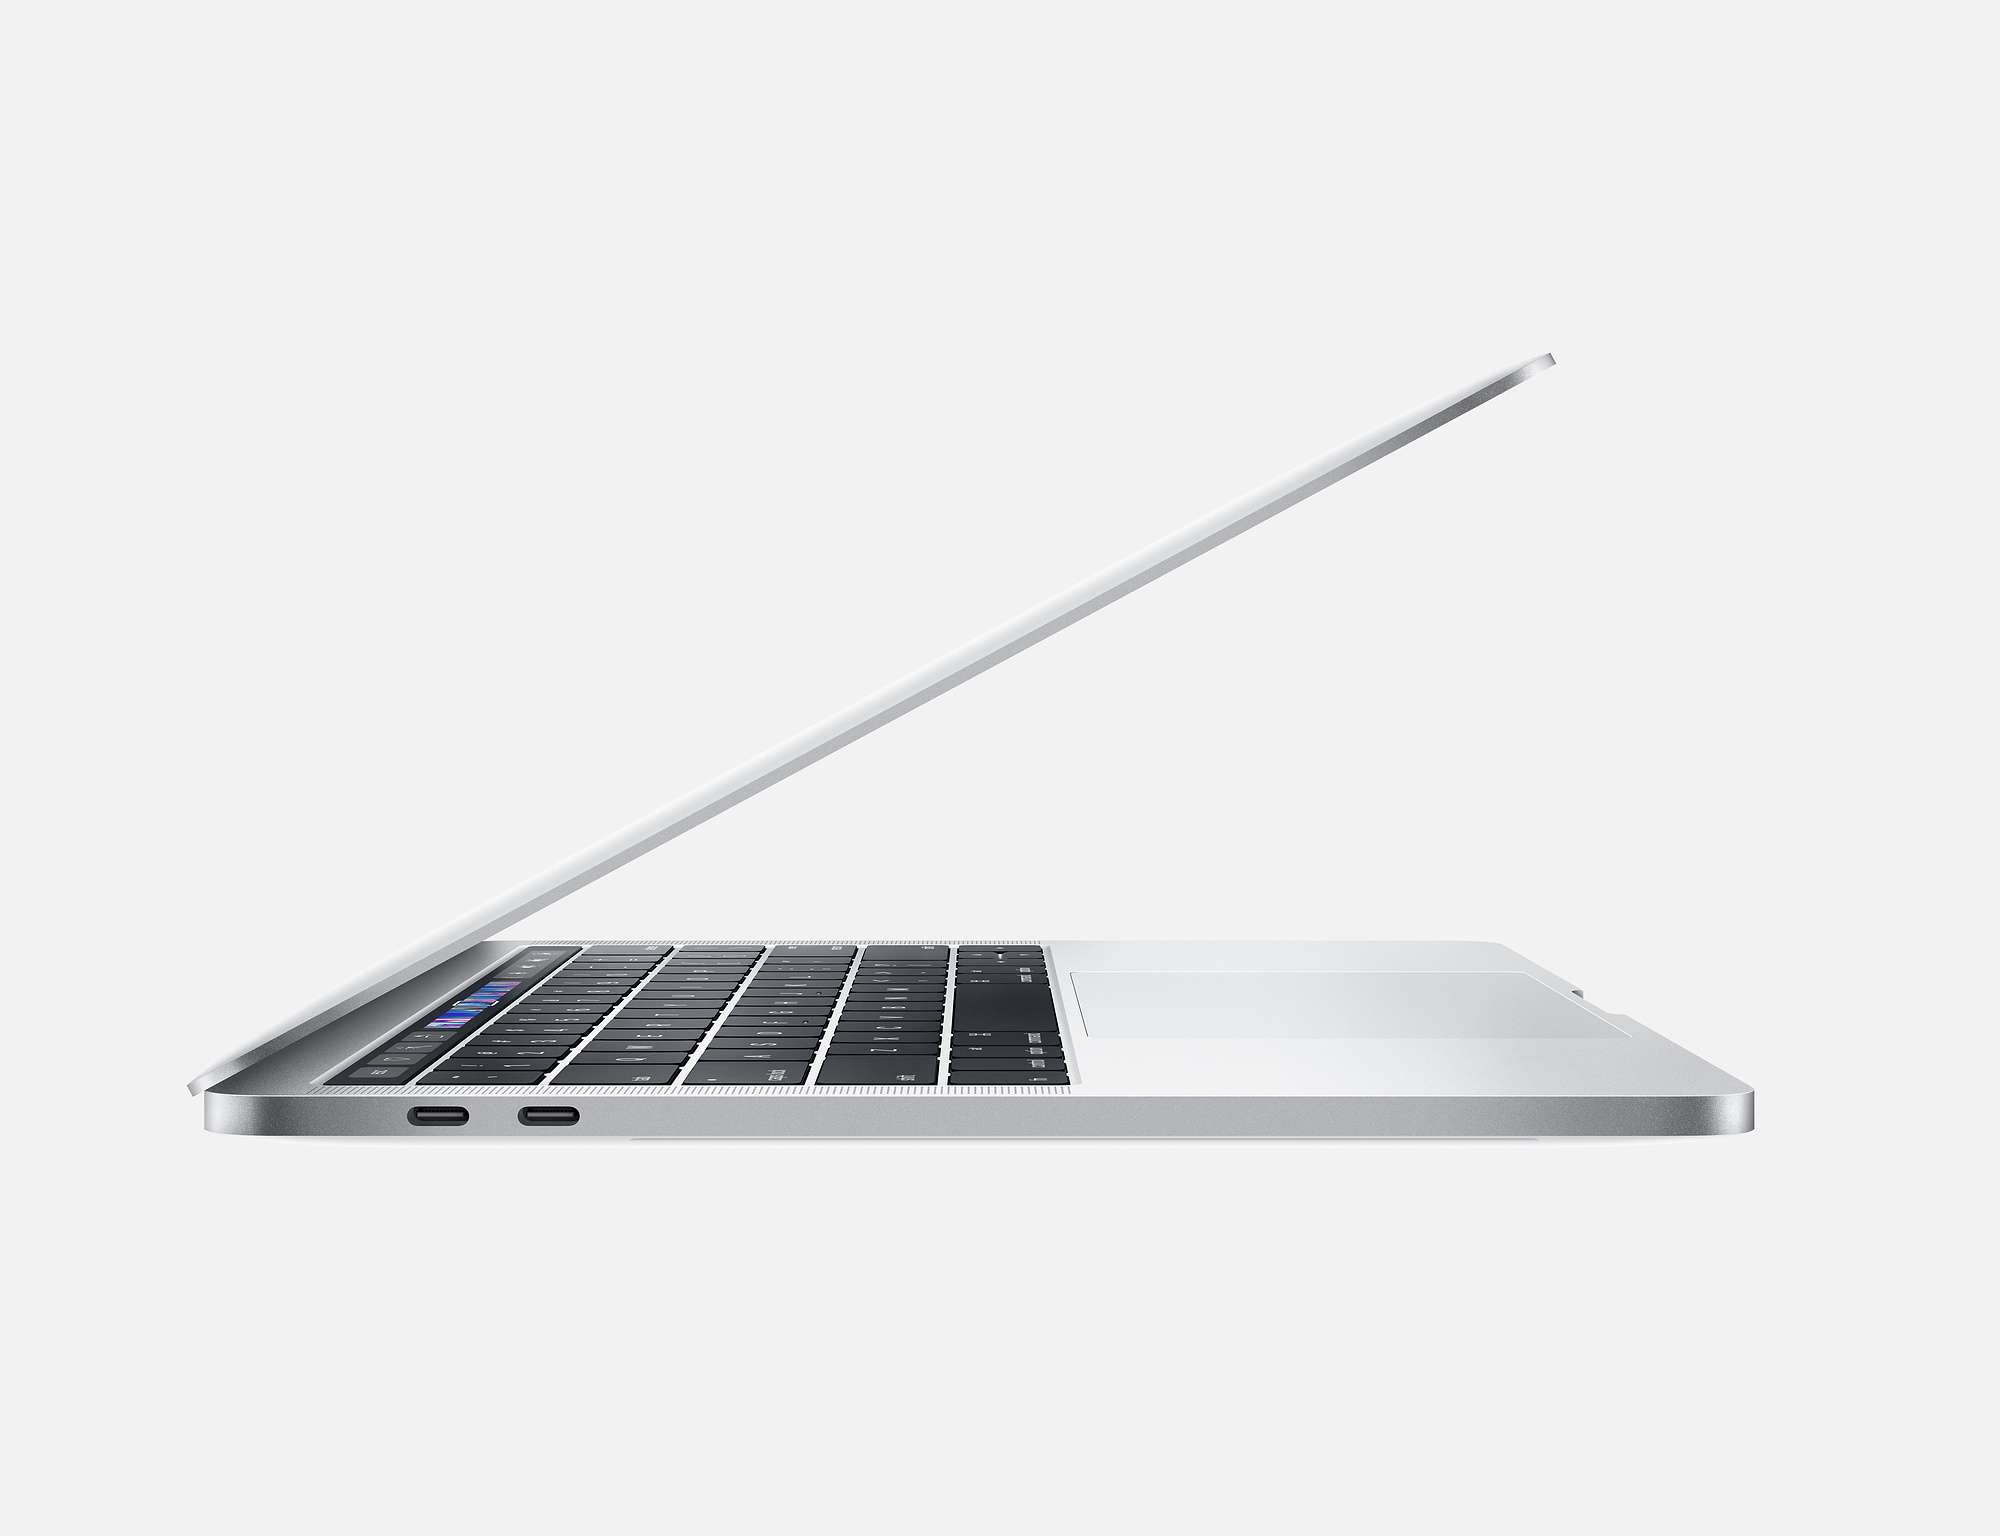 MacBook Pro 13'' TB 1.4GHz QC i5 8GB 256GB Silver